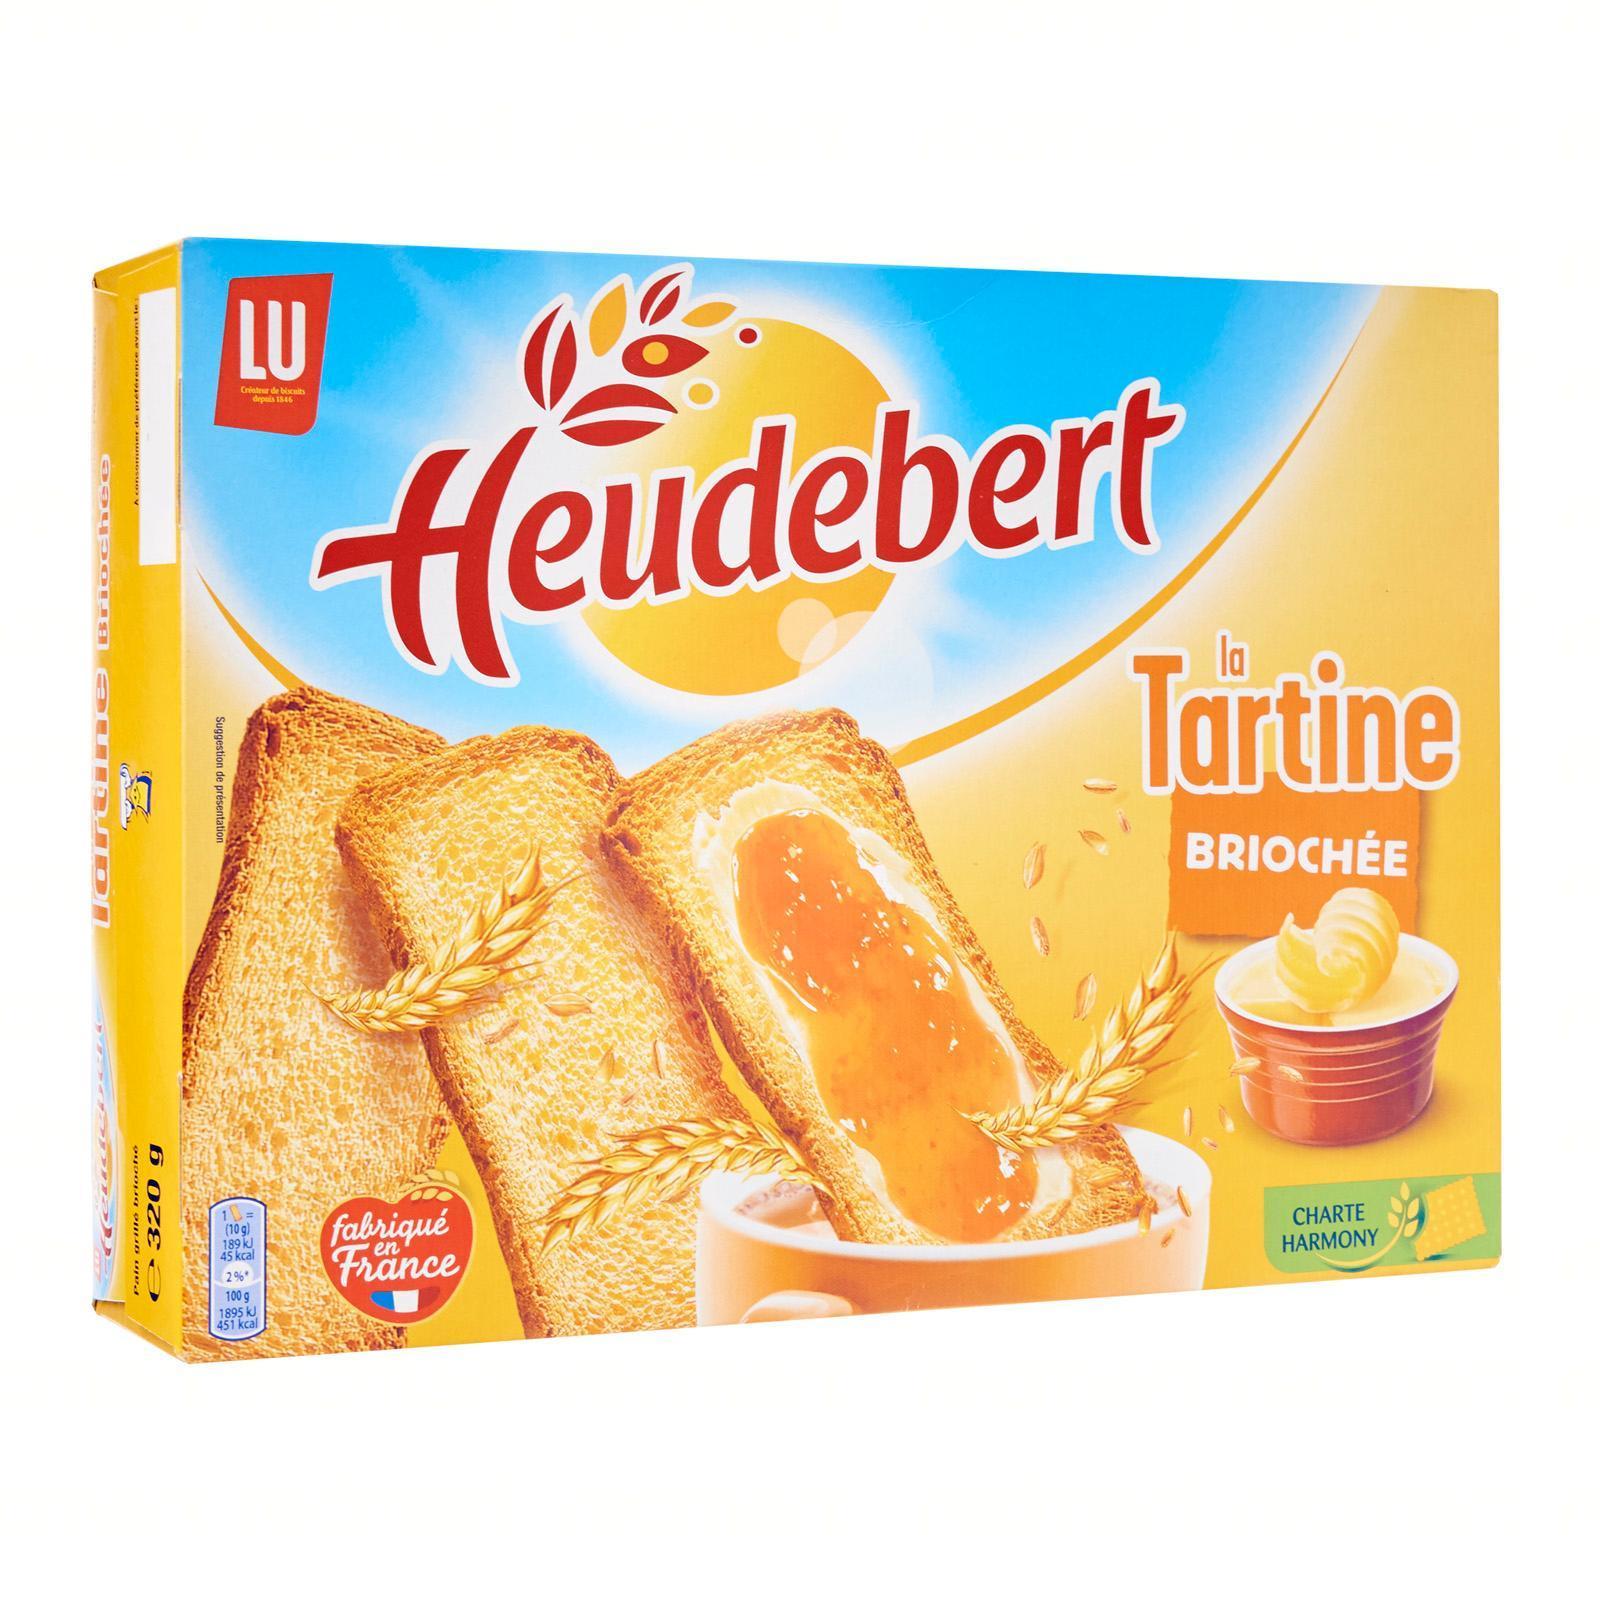 Heudebert Brioche Tartines - 24 Slices - By Le Petit Depot By Redmart.